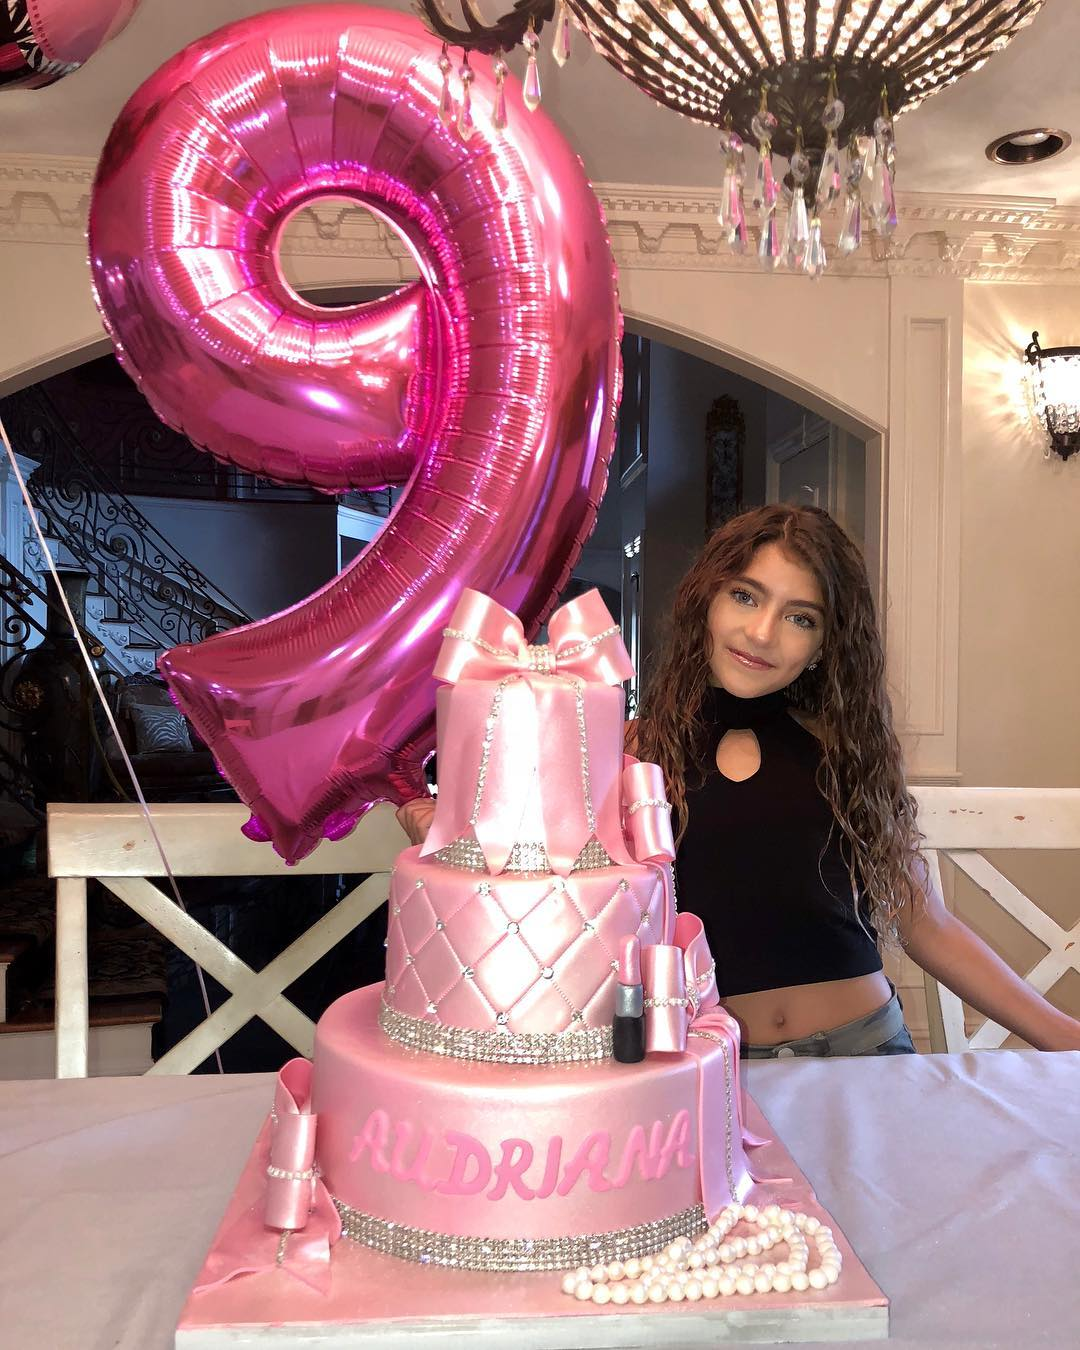 Astonishing Audriana Giudice And Birthday Cake The Hollywood Gossip Funny Birthday Cards Online Elaedamsfinfo